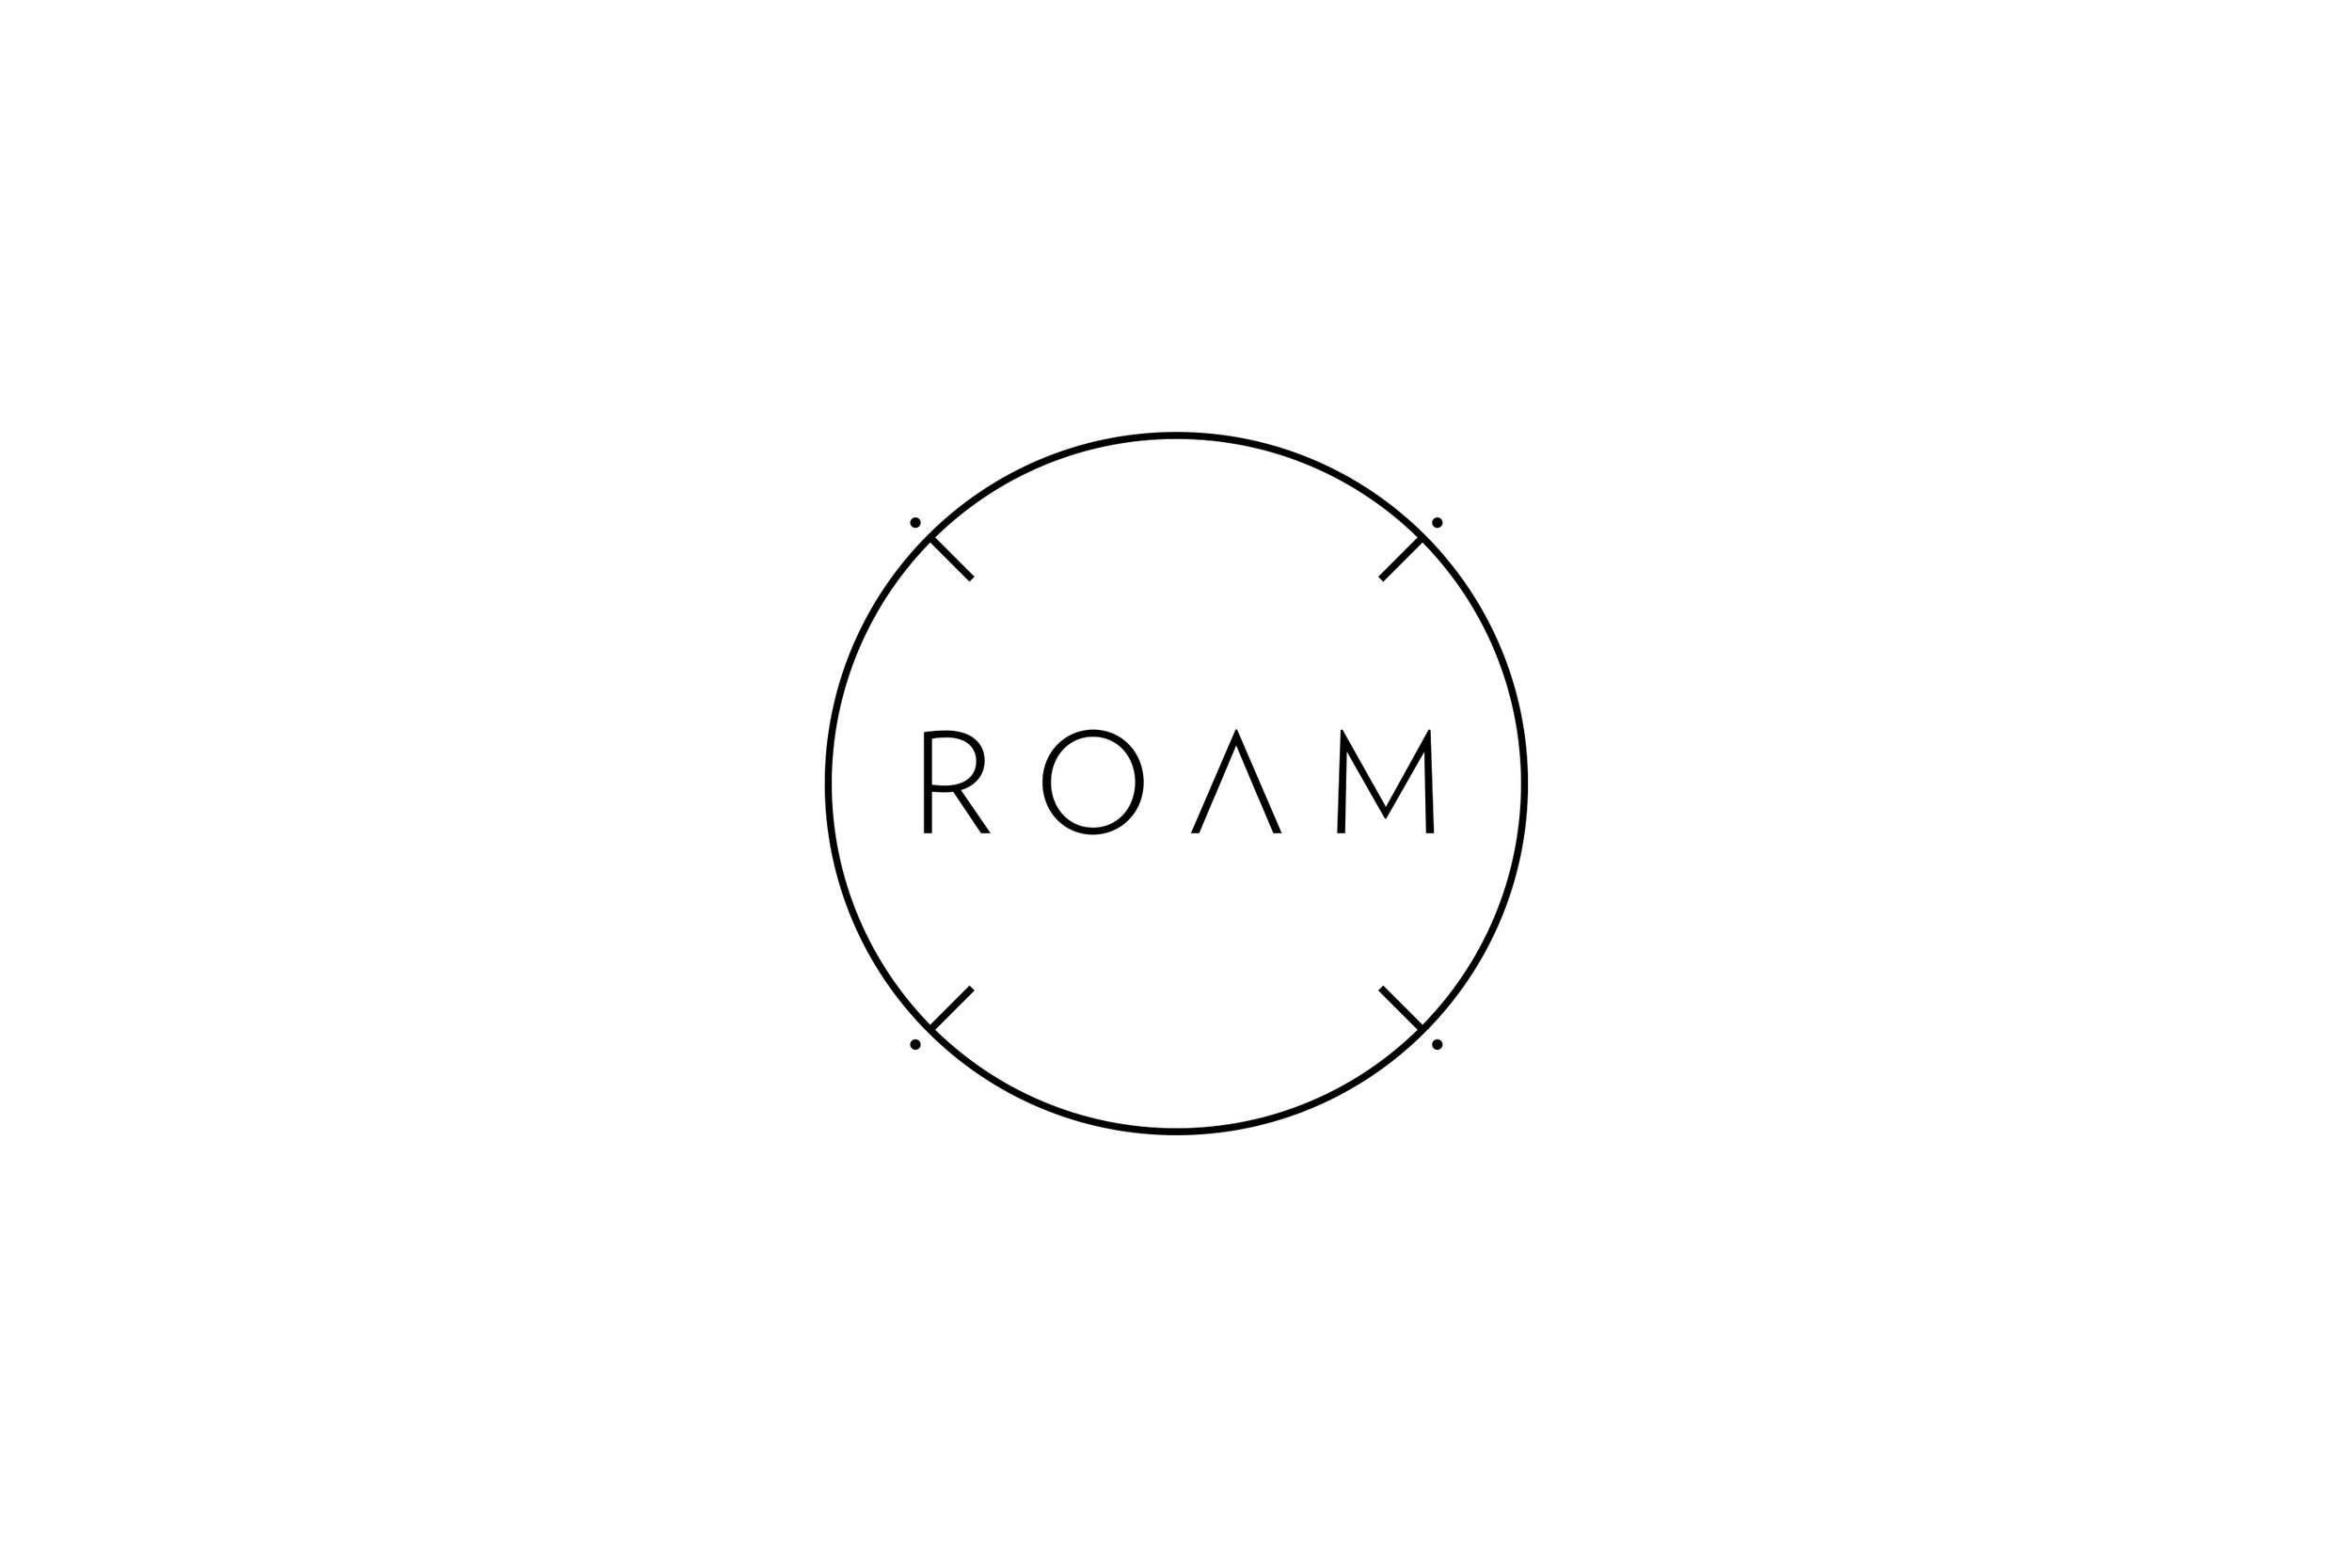 roam-logo-black.jpg